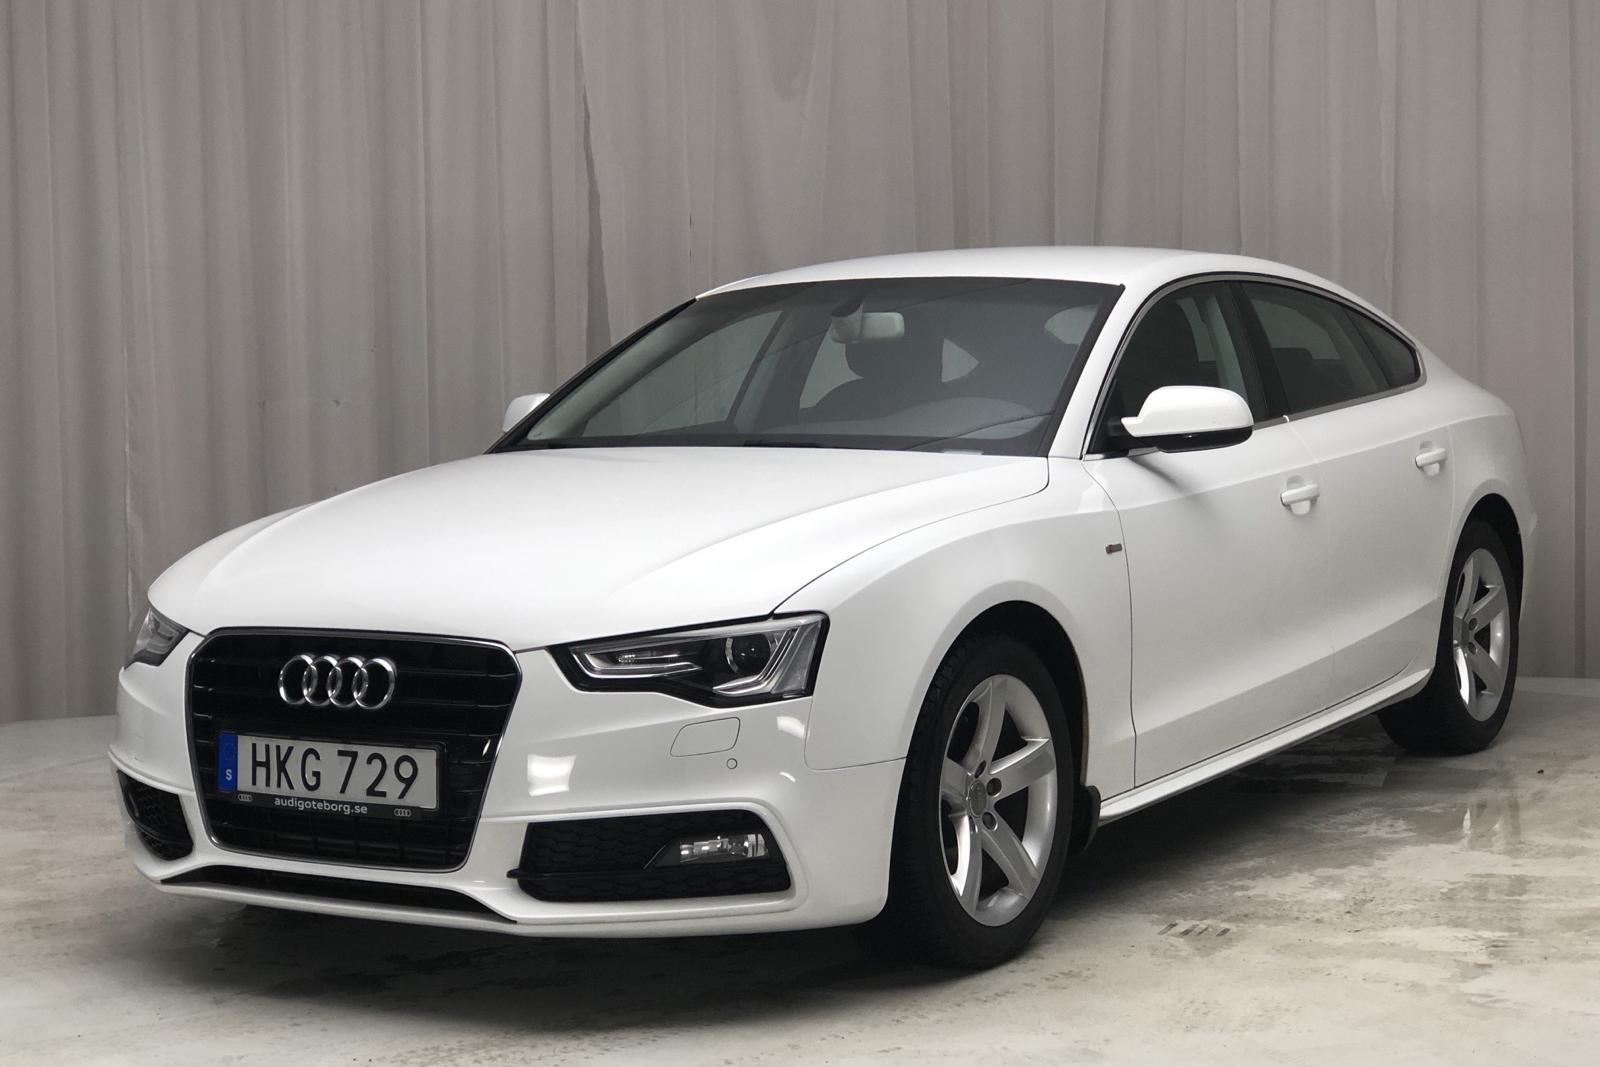 Audi A5 1.8 TFSI Sportback (177hk) - 27 350 km - Automatic - white - 2016